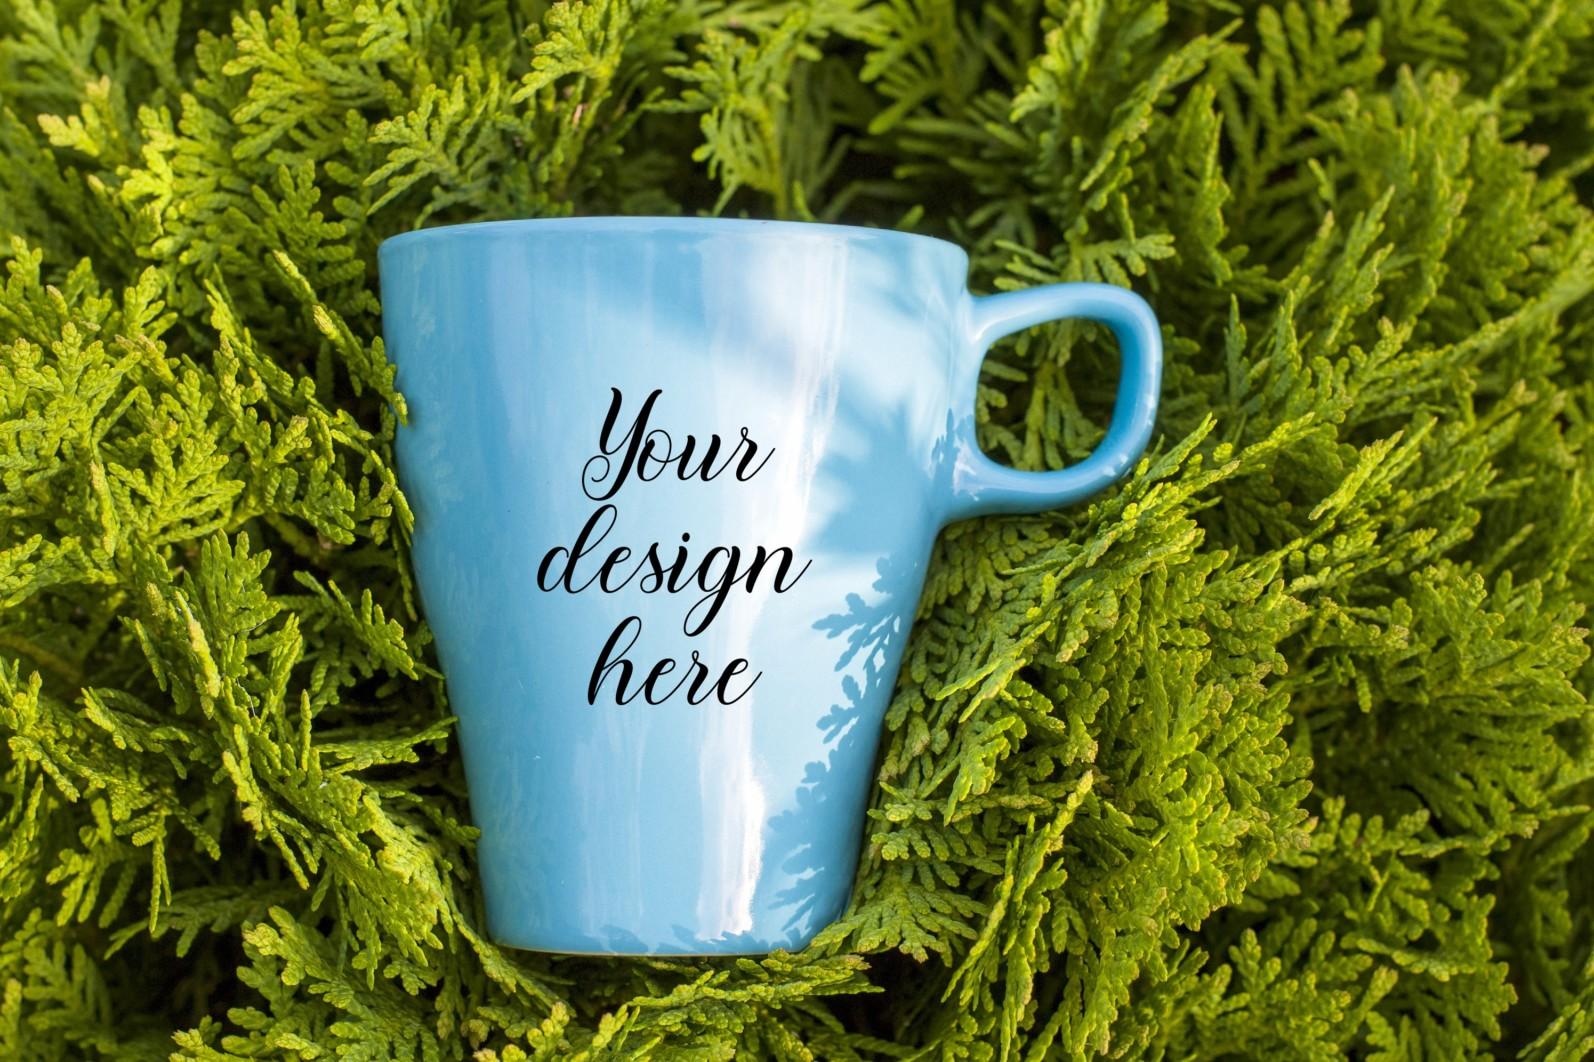 Coffee mug mockup bundle. Mug template bundle. PSD, JPEG files. - 5 1 1 scaled -